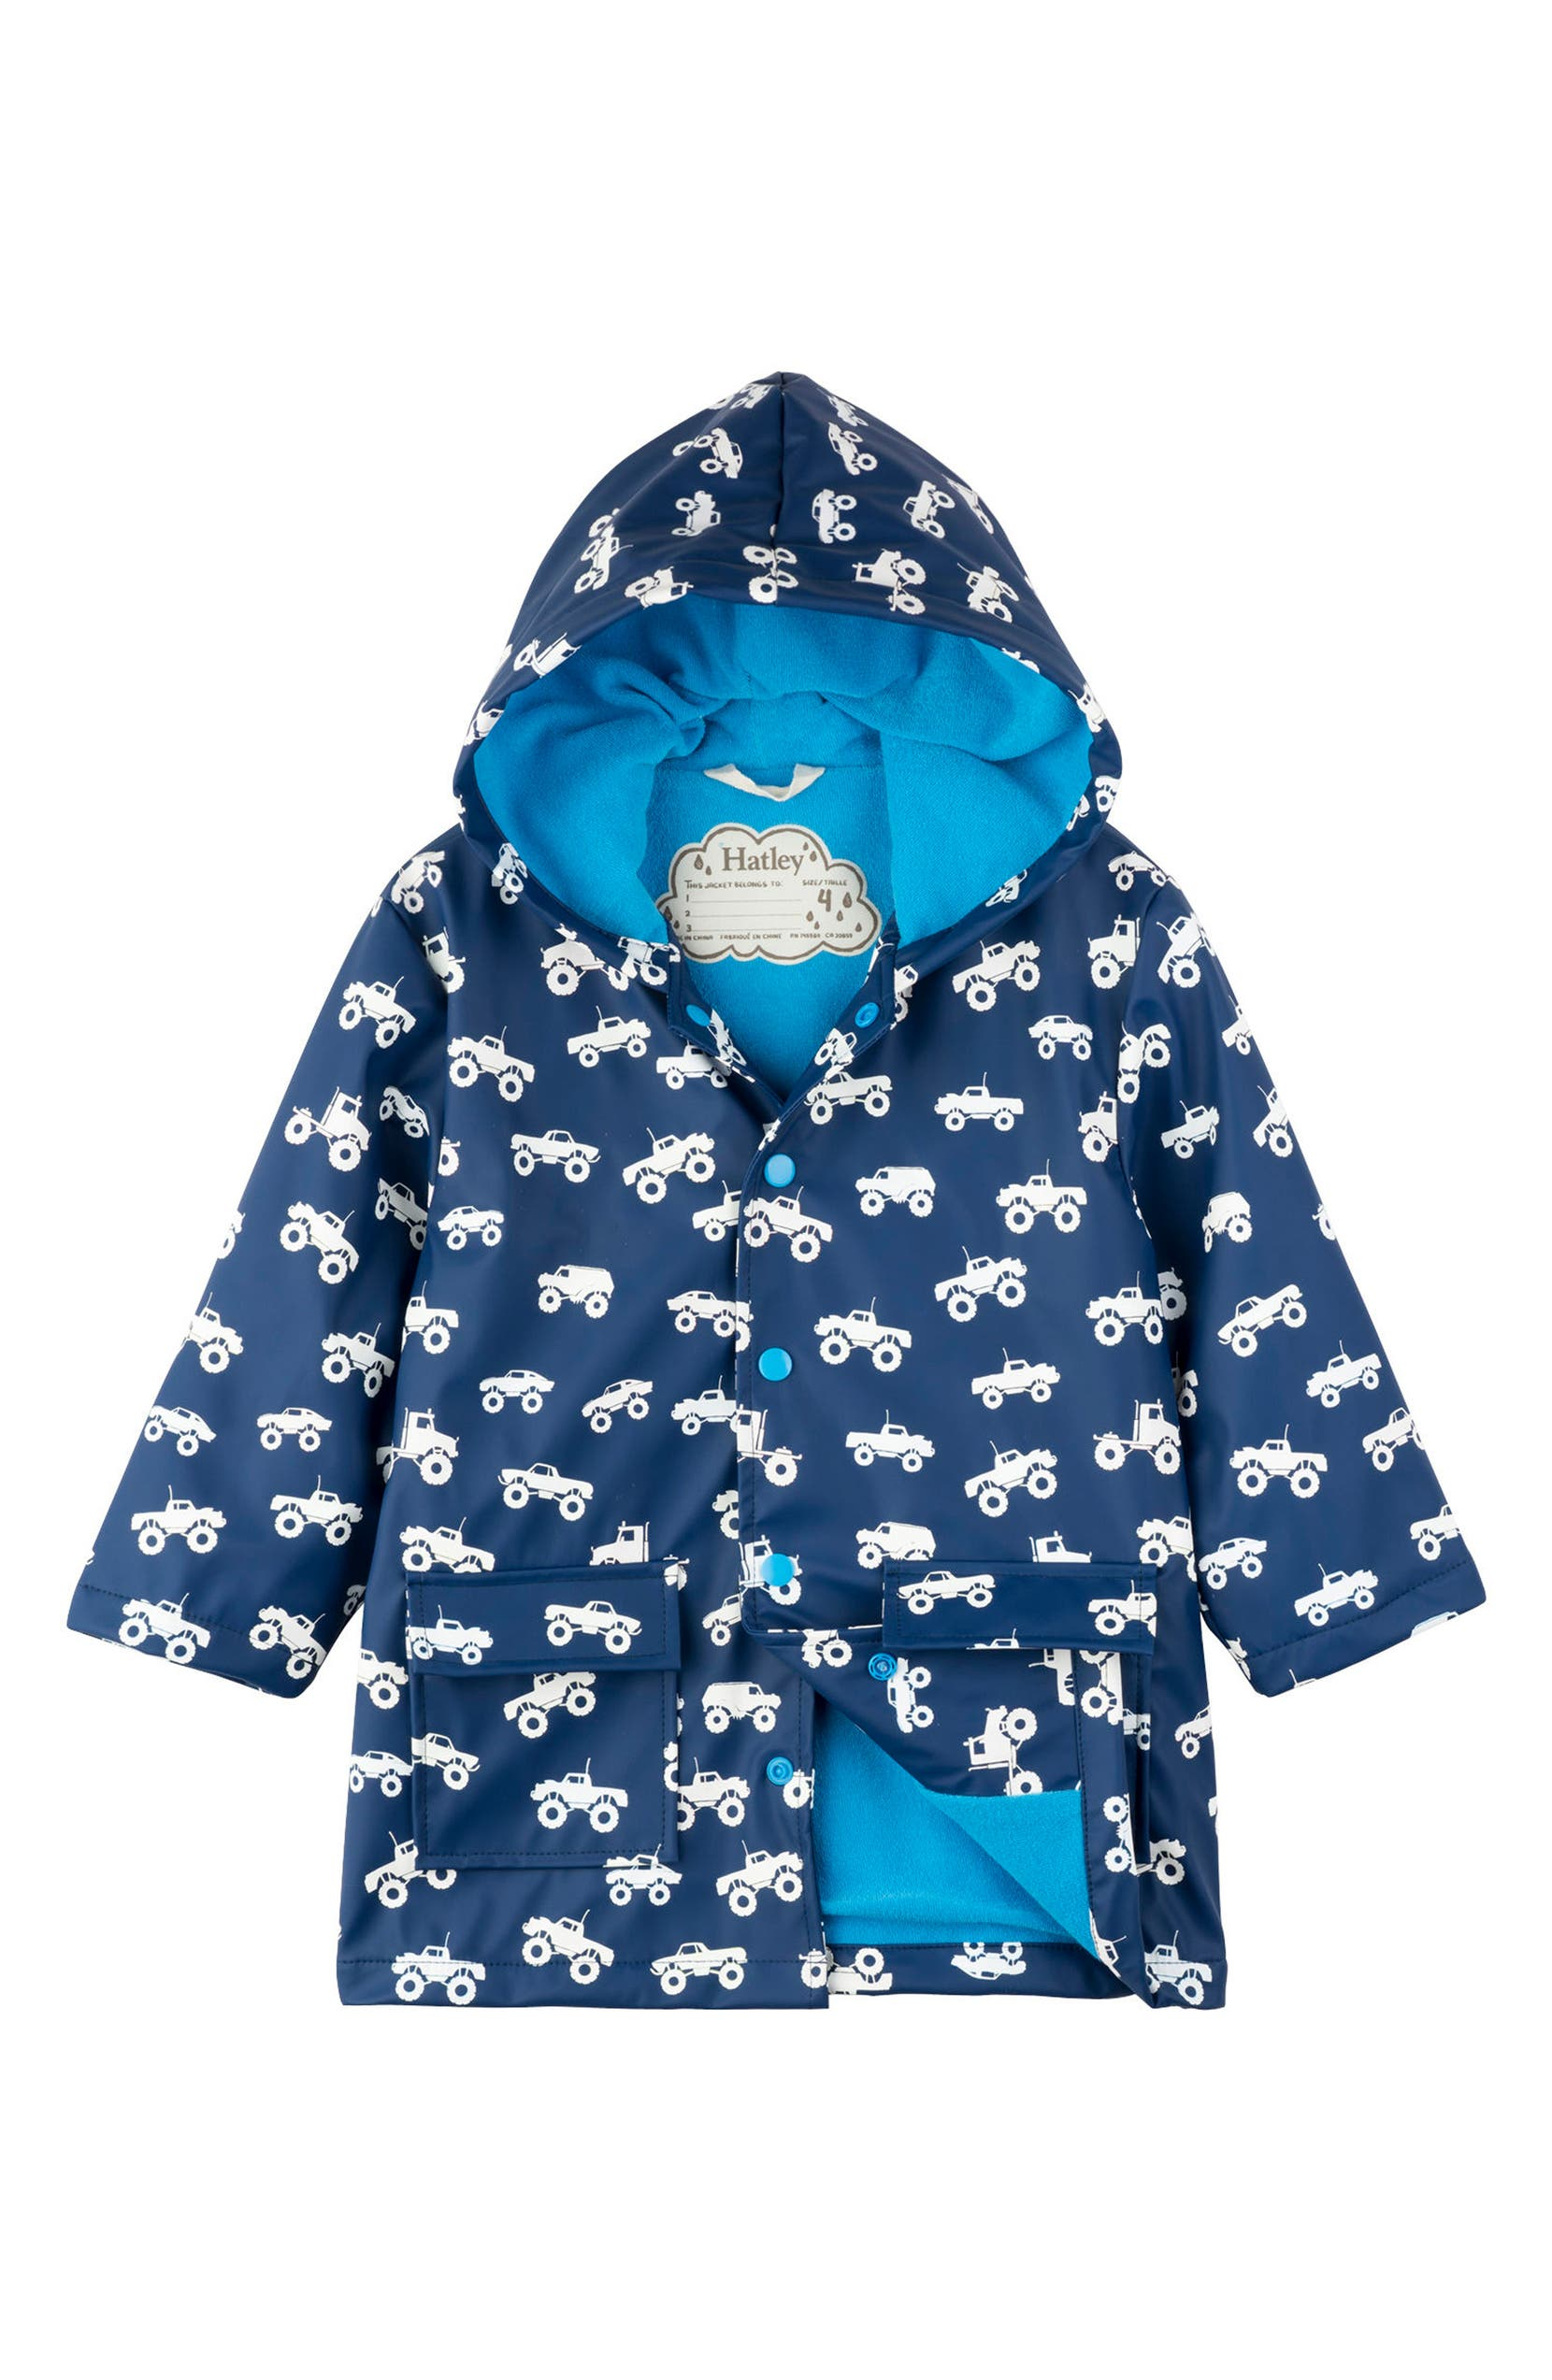 994176bd87f5 Hatley Monster Trucks Color Change Waterproof Raincoat (Toddler Boys ...